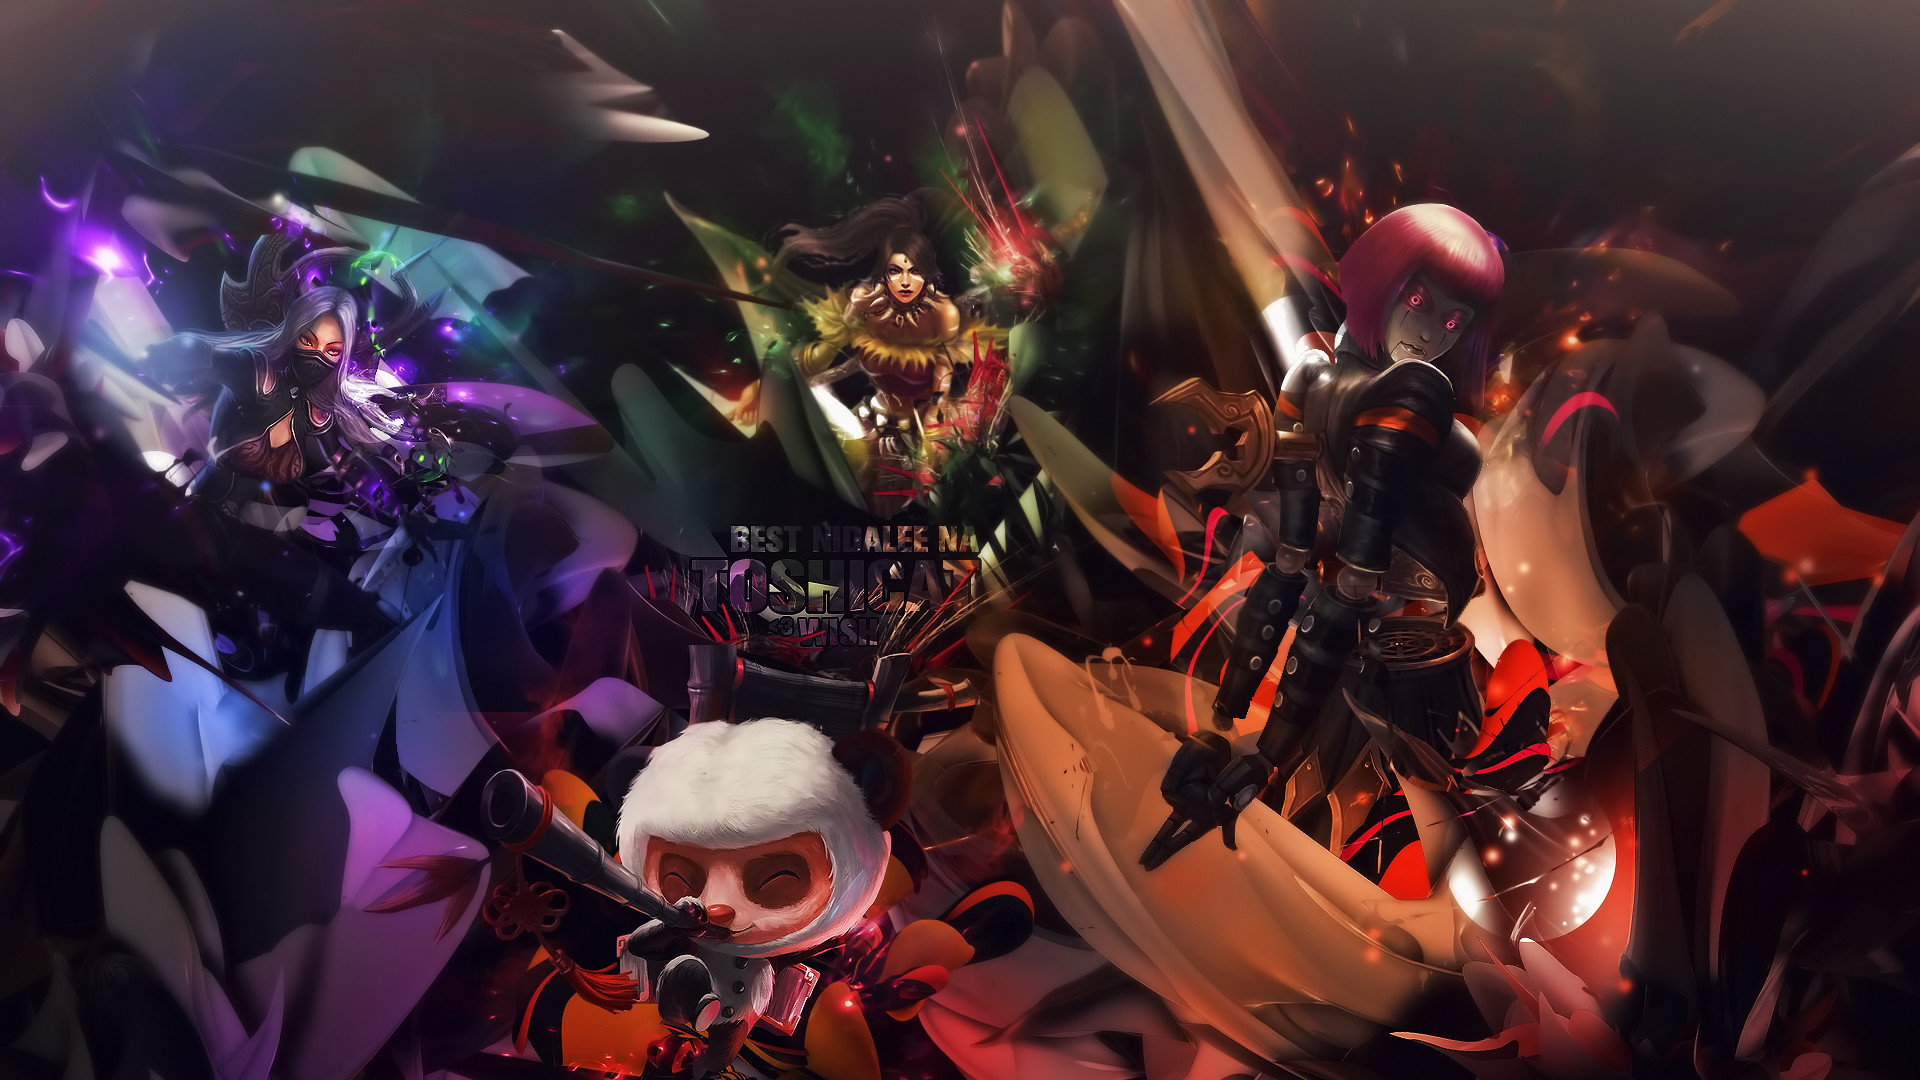 League of Legends Wallpaper by Wishlah League of Legends Wallpaper by  Wishlah